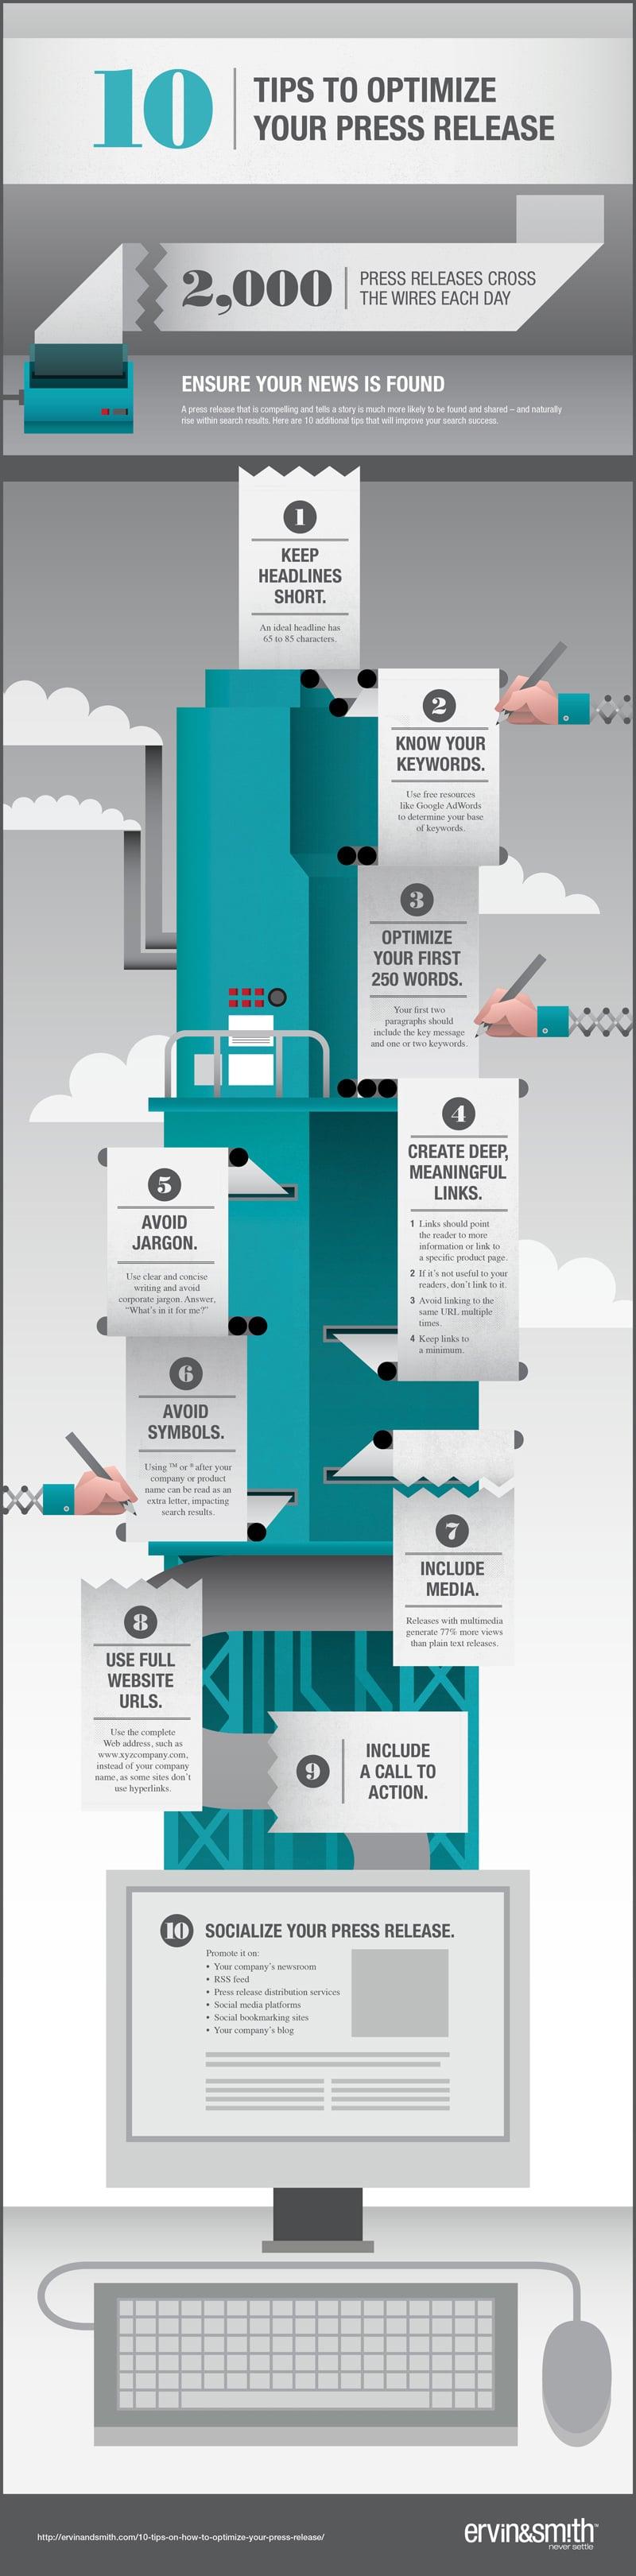 Infographic_OptimizePR_fnl-800